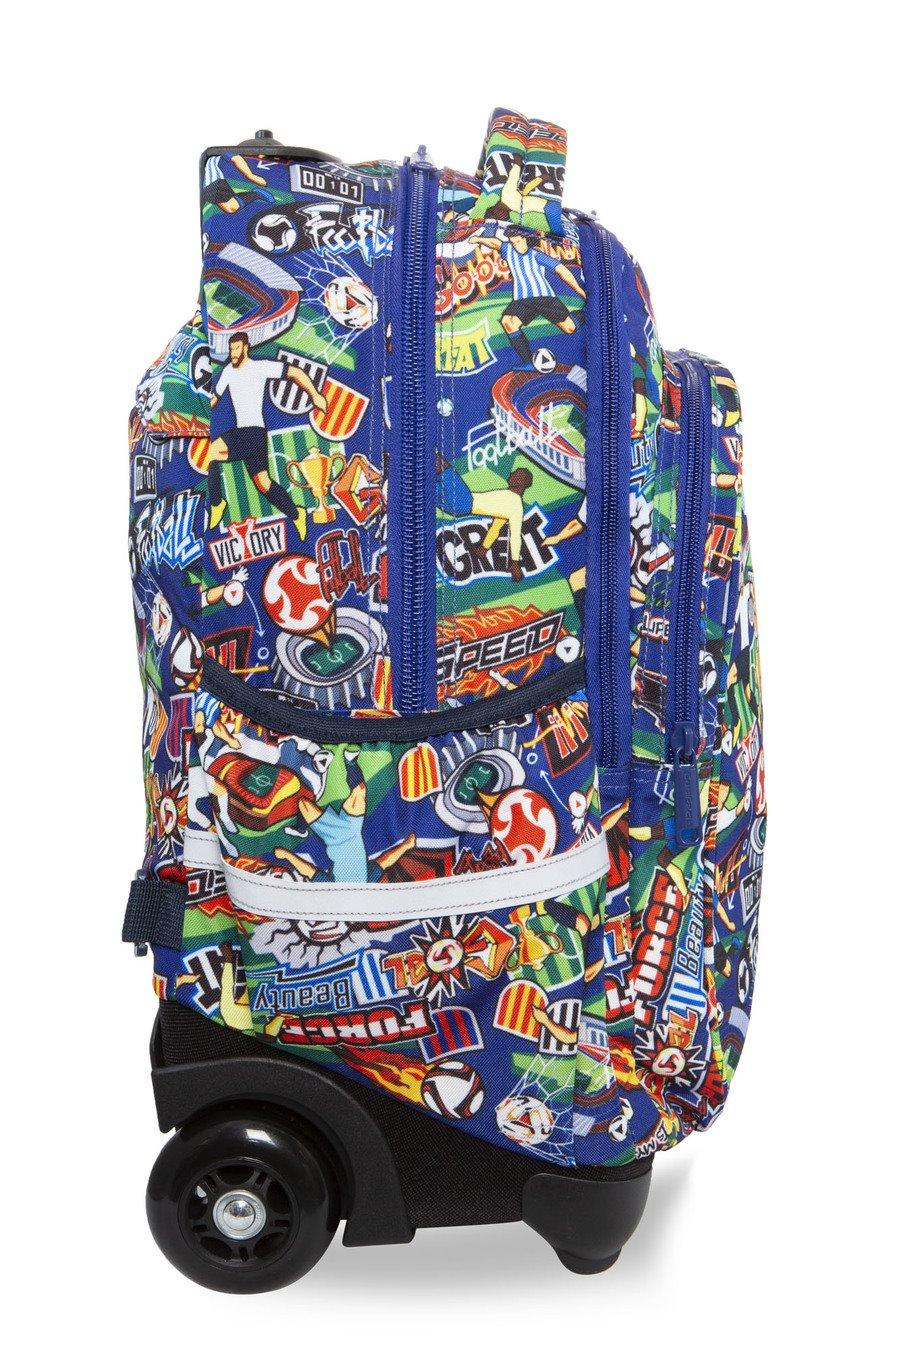 dd0edf03a7 Školská taška batoh na kolieskách coolpack junior